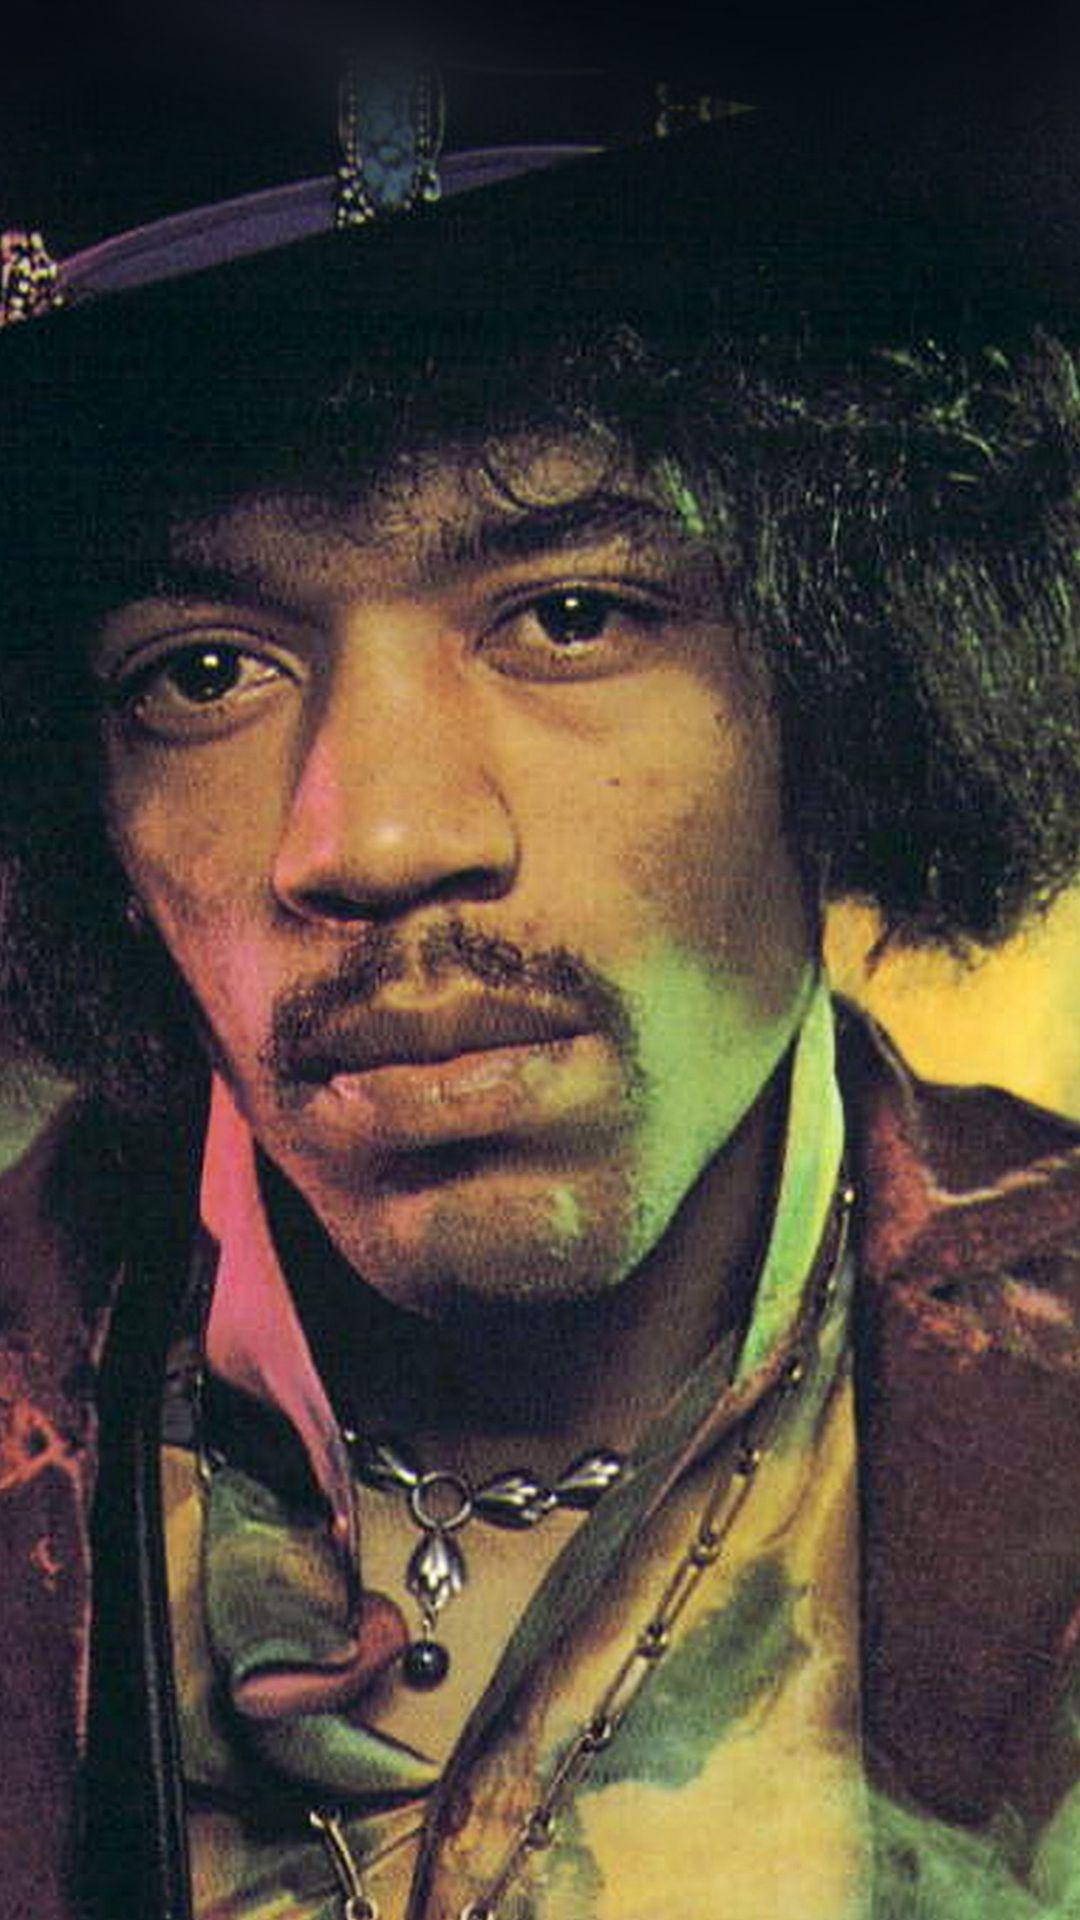 Jimi Hendrix Face Music Regae Artist Iphone 6 Wallpaper Jimi Hendrix Rock Music History Hendrix